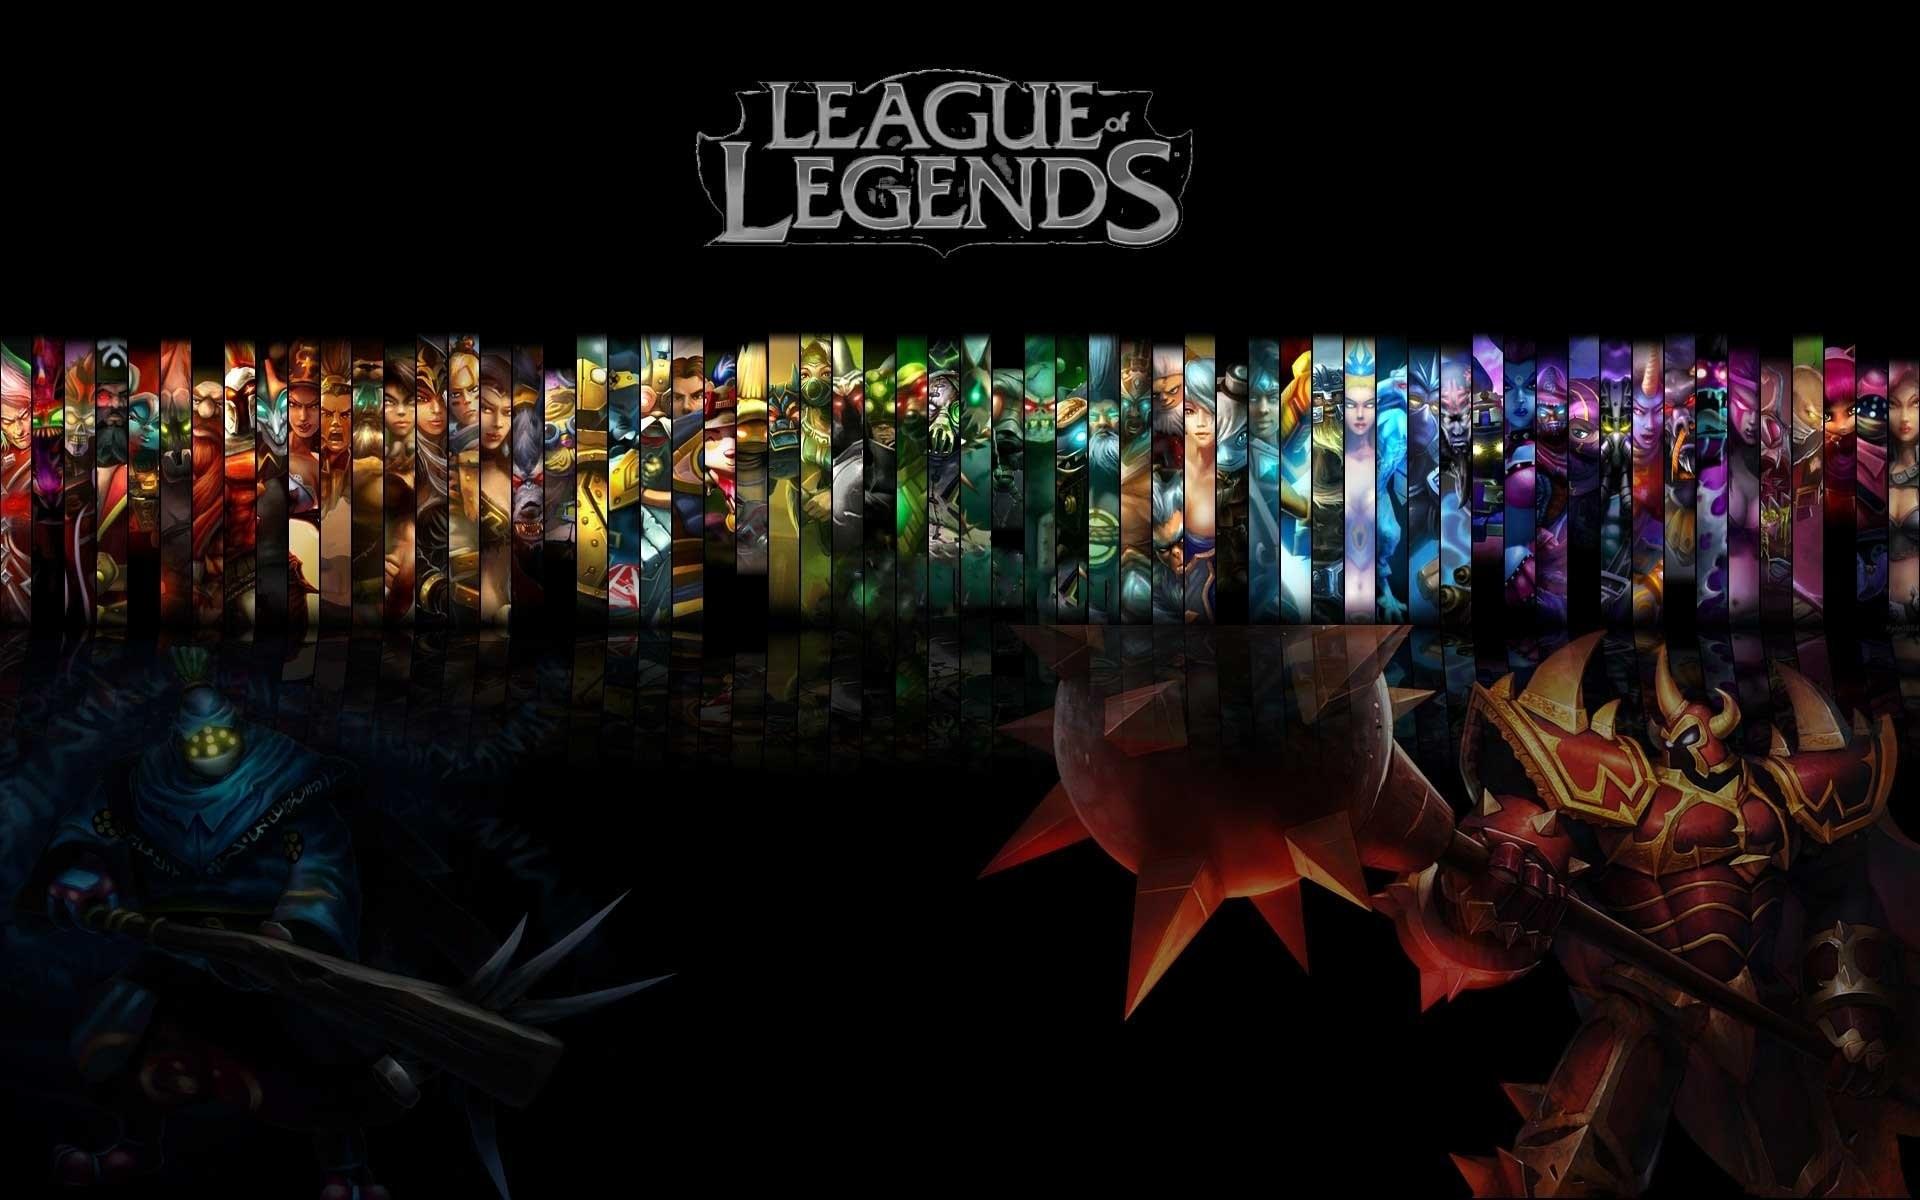 wallpaper zelda wallpapers legend photo dark league static legends 4k full  hd iphone android wallpaper